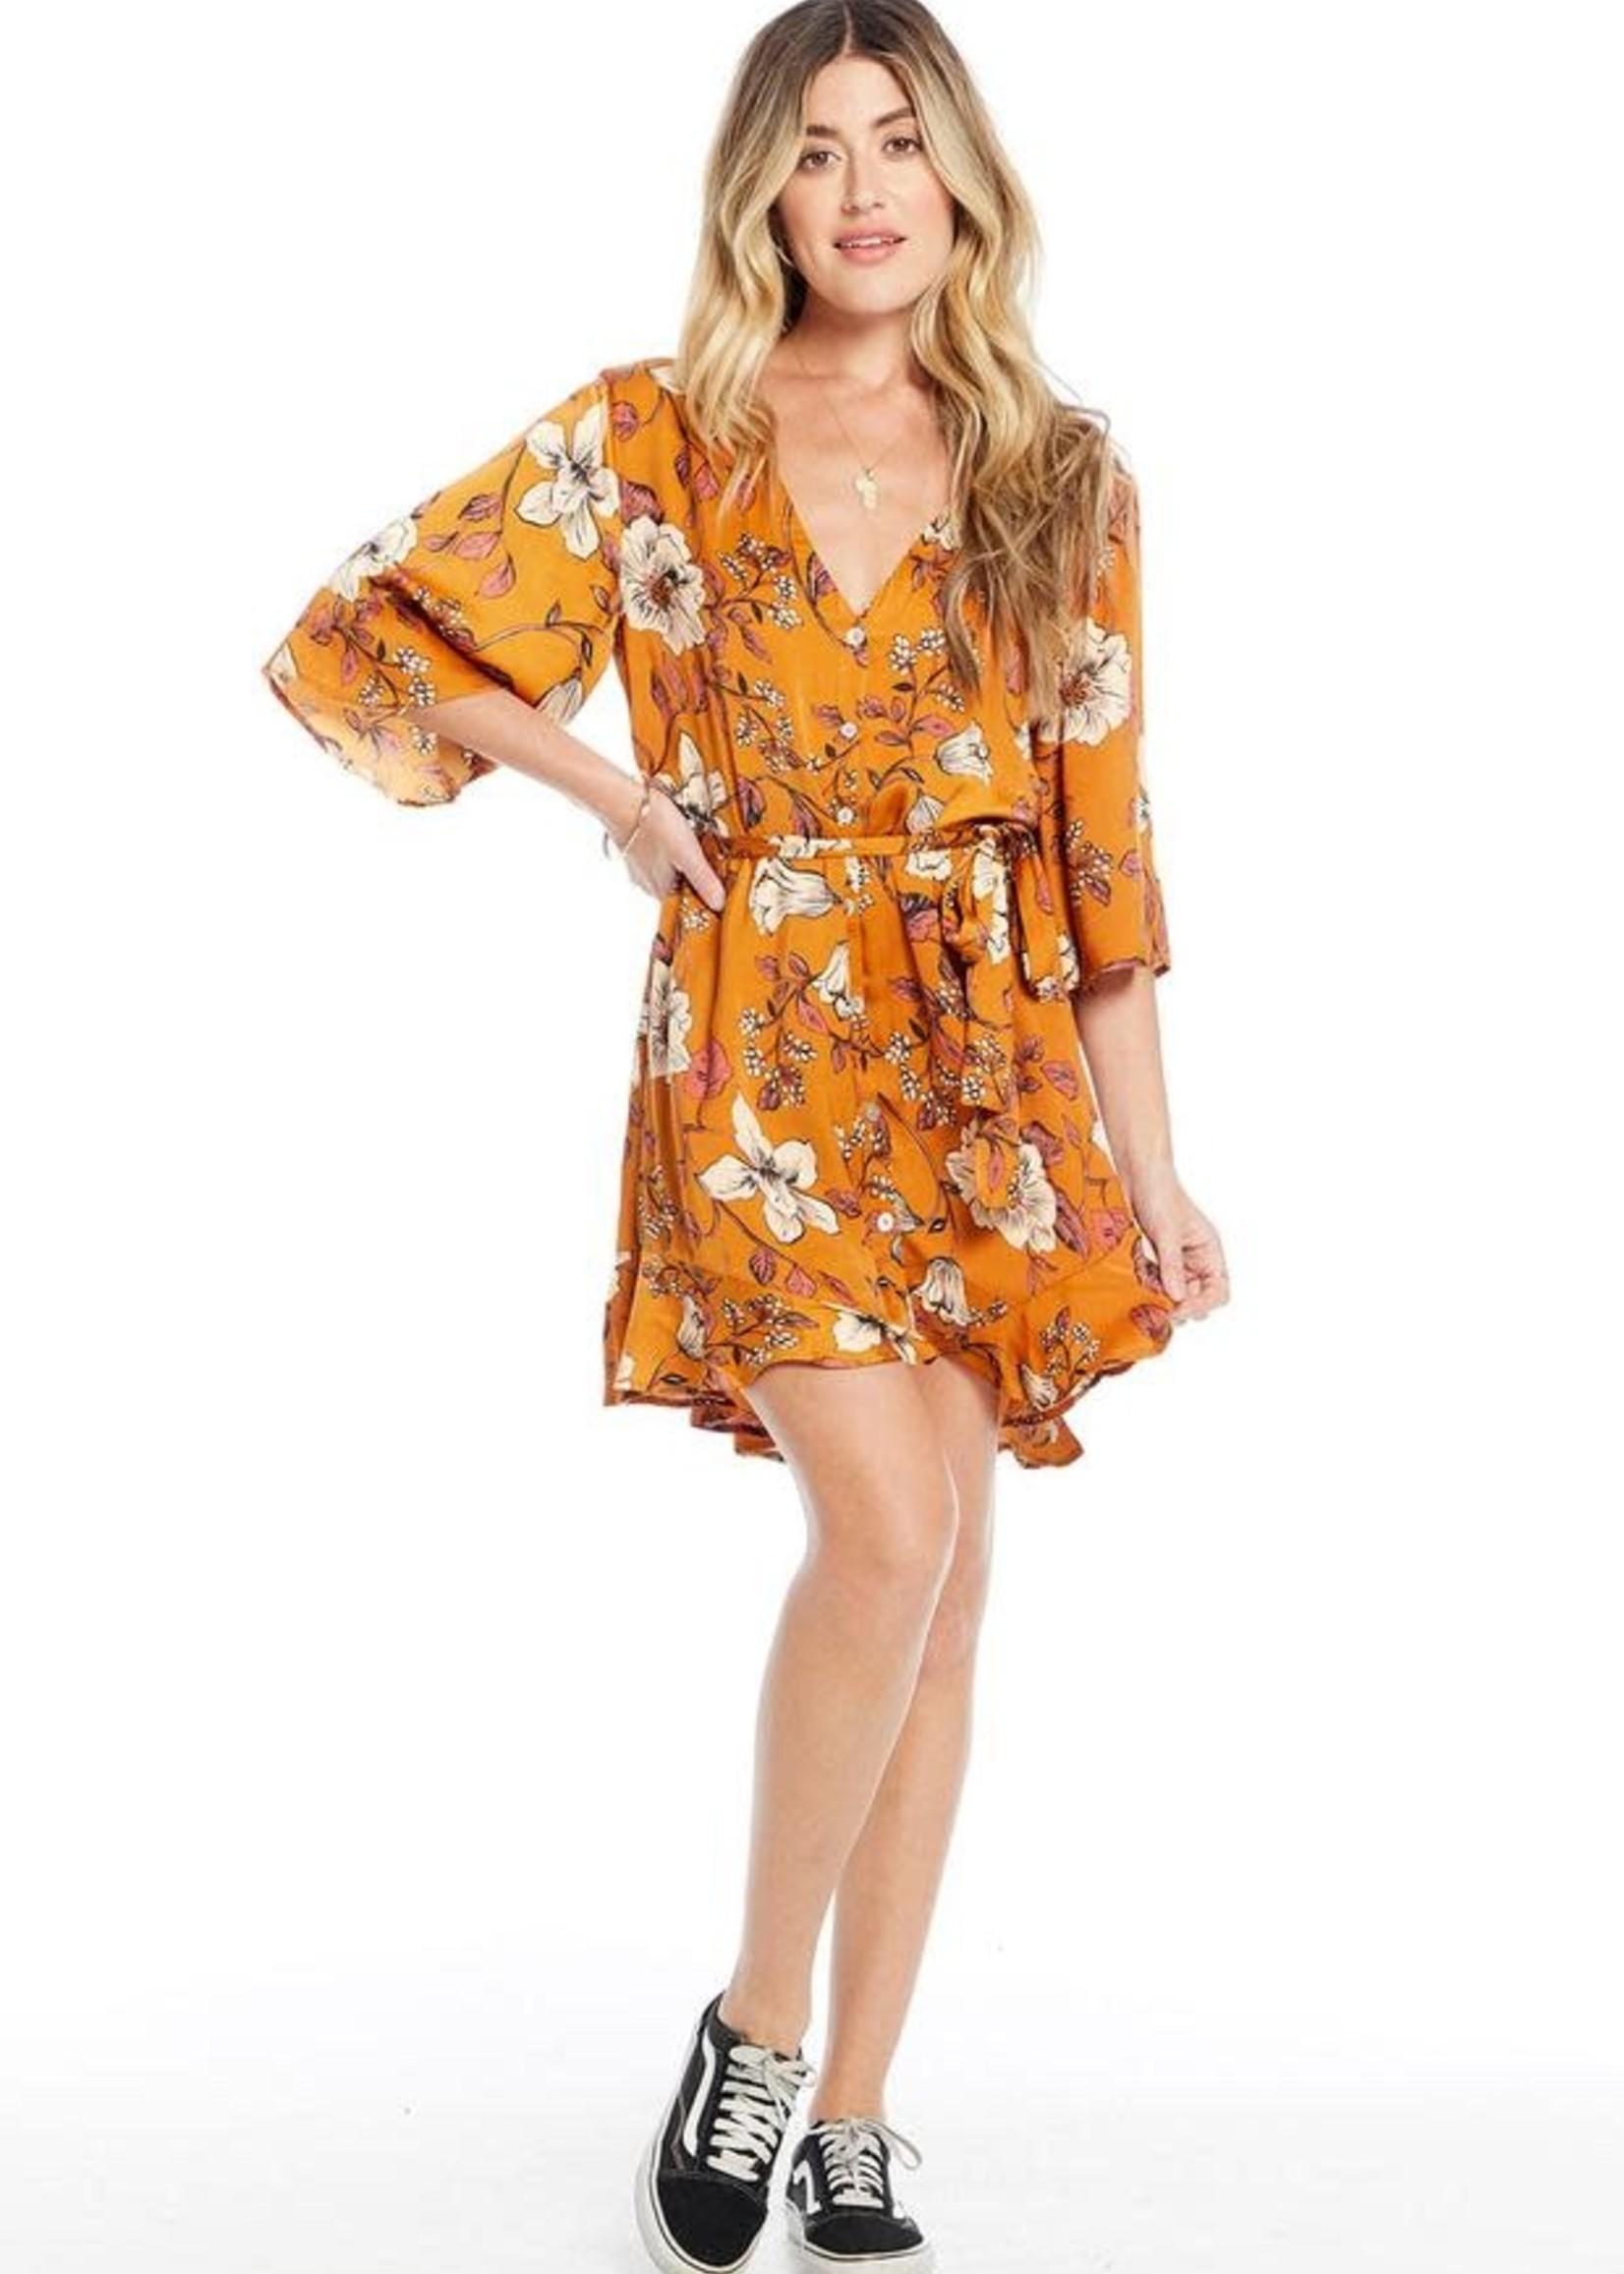 SALTWATER LUXE AMBER Dress